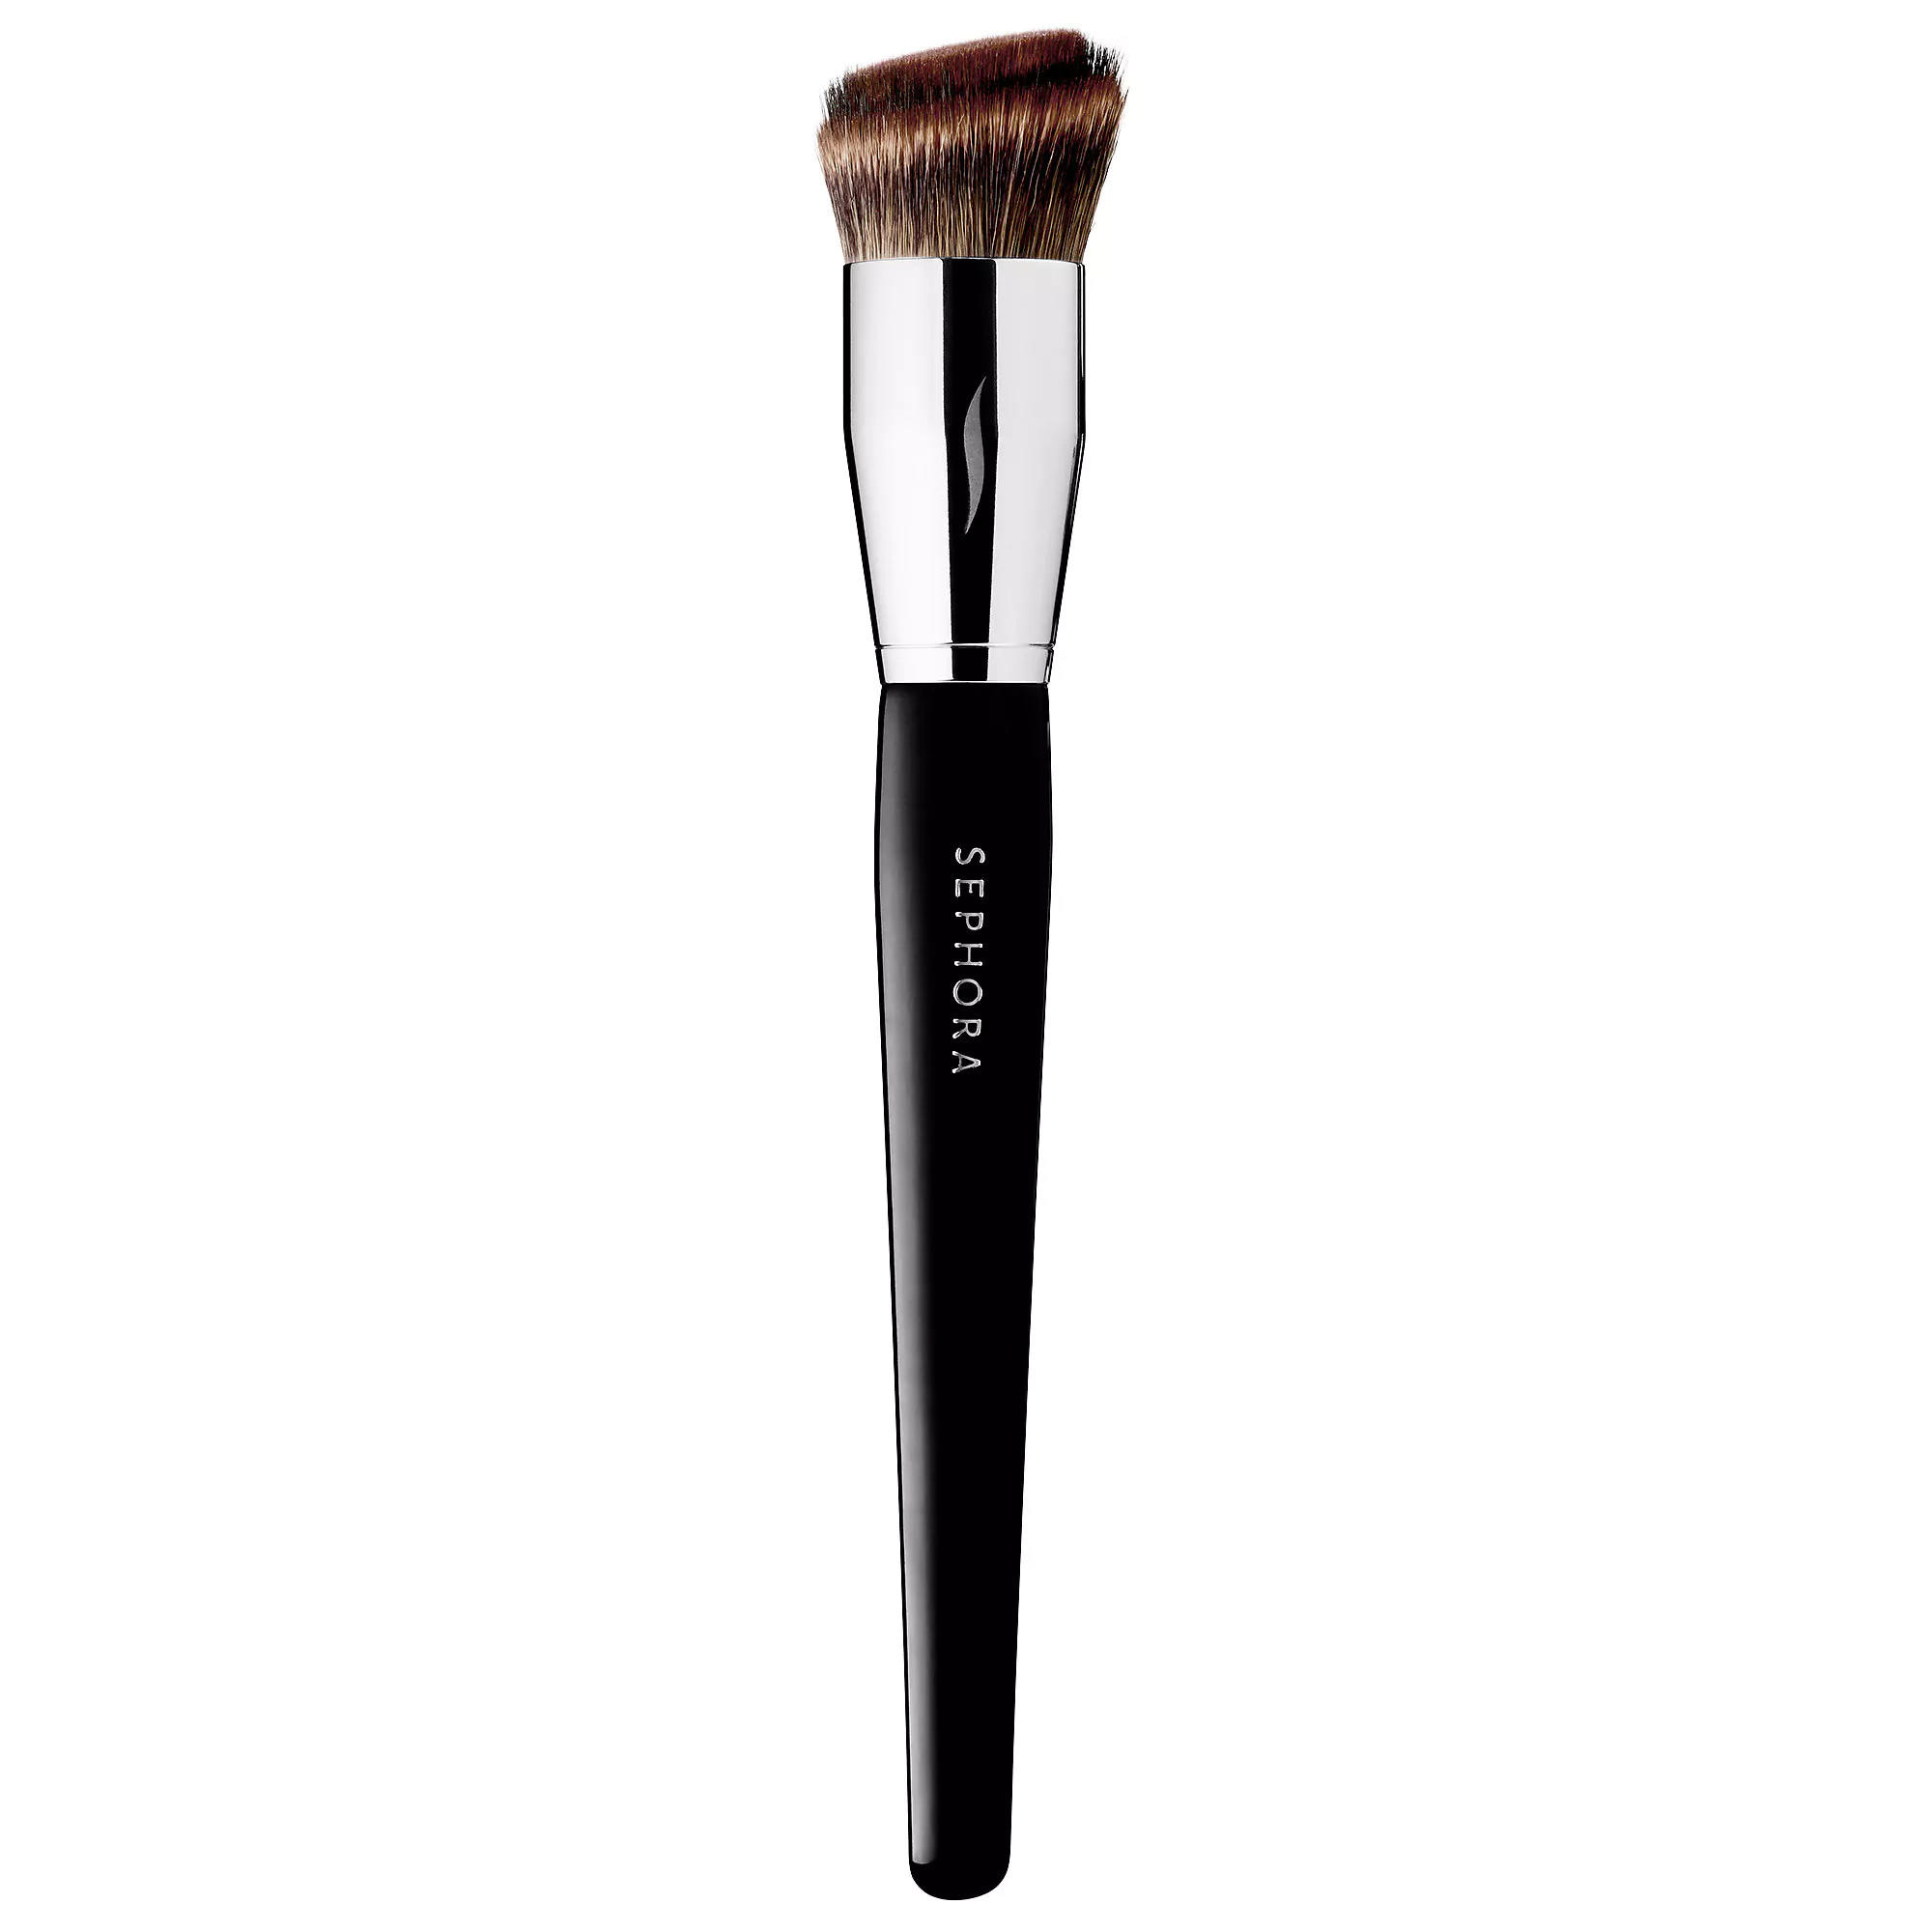 Sephora PRO Core Diffuser Angled Brush #95